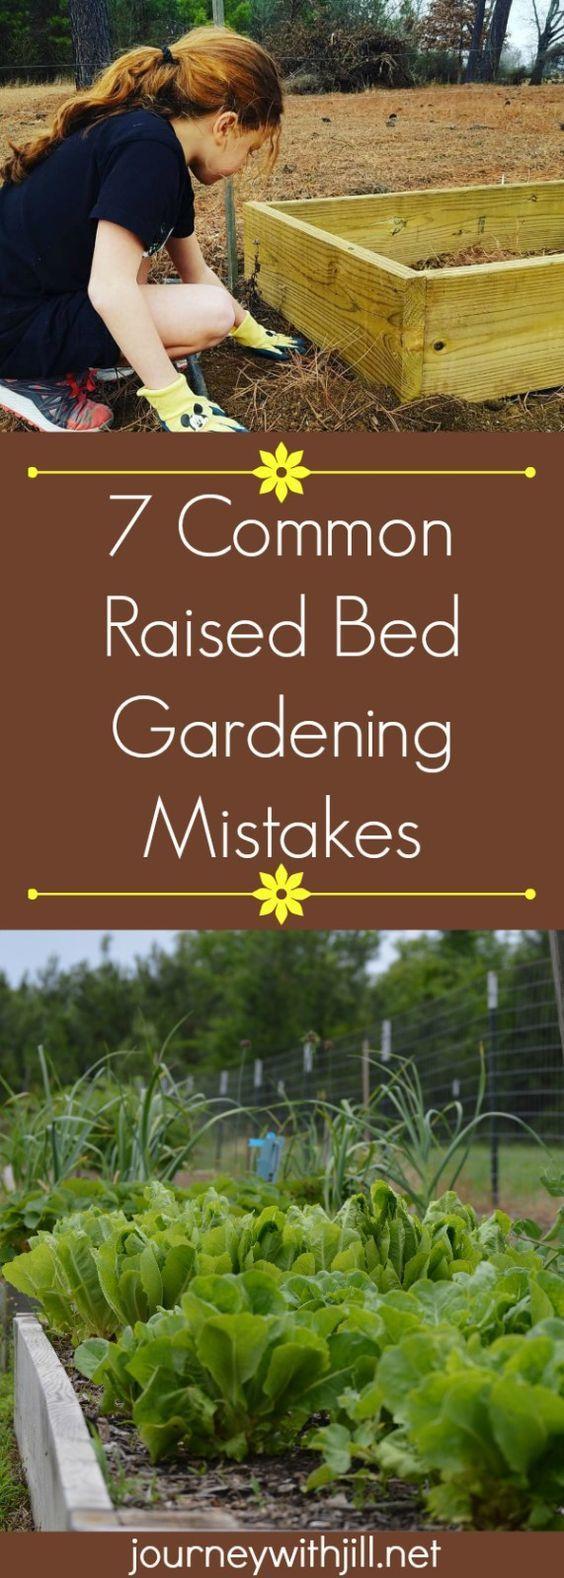 67 best gardening images on Pinterest | Flower gardening, Backyard ...